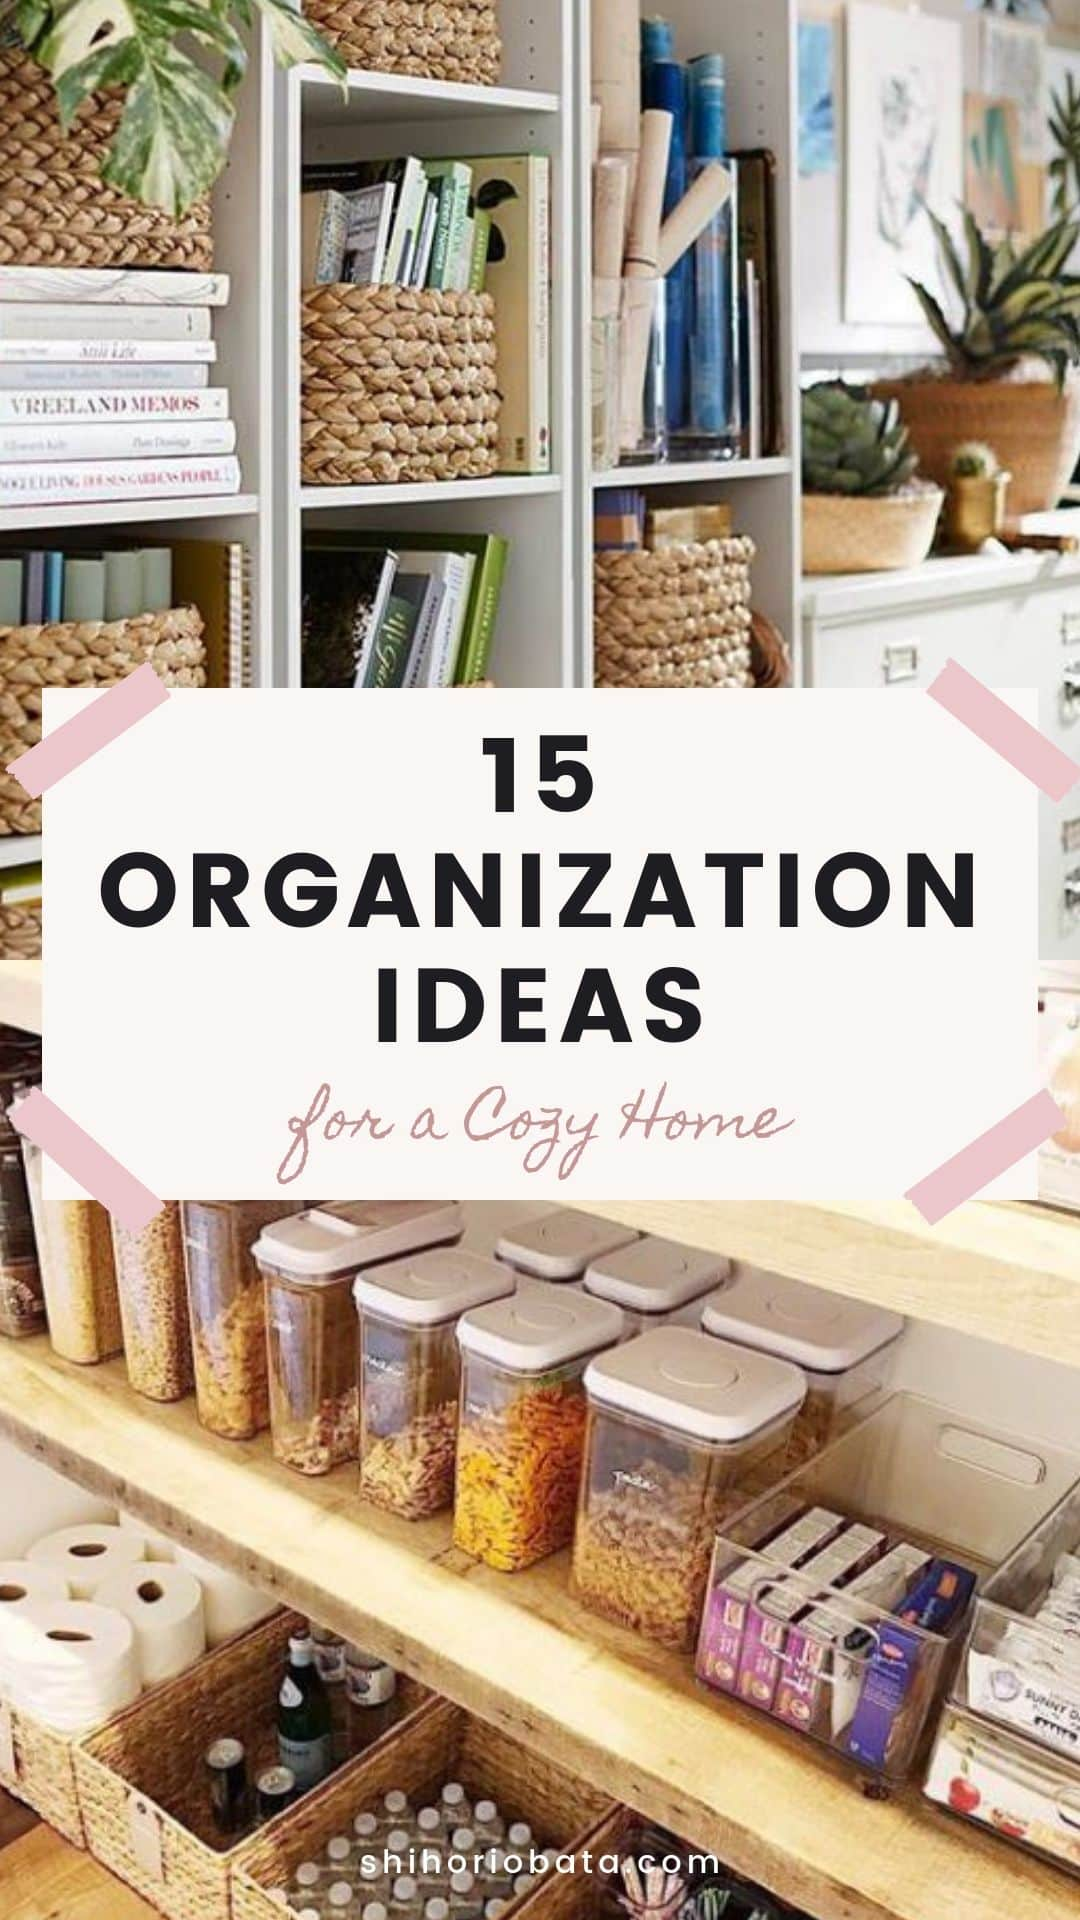 15 Organization Ideas for a Cozy Home